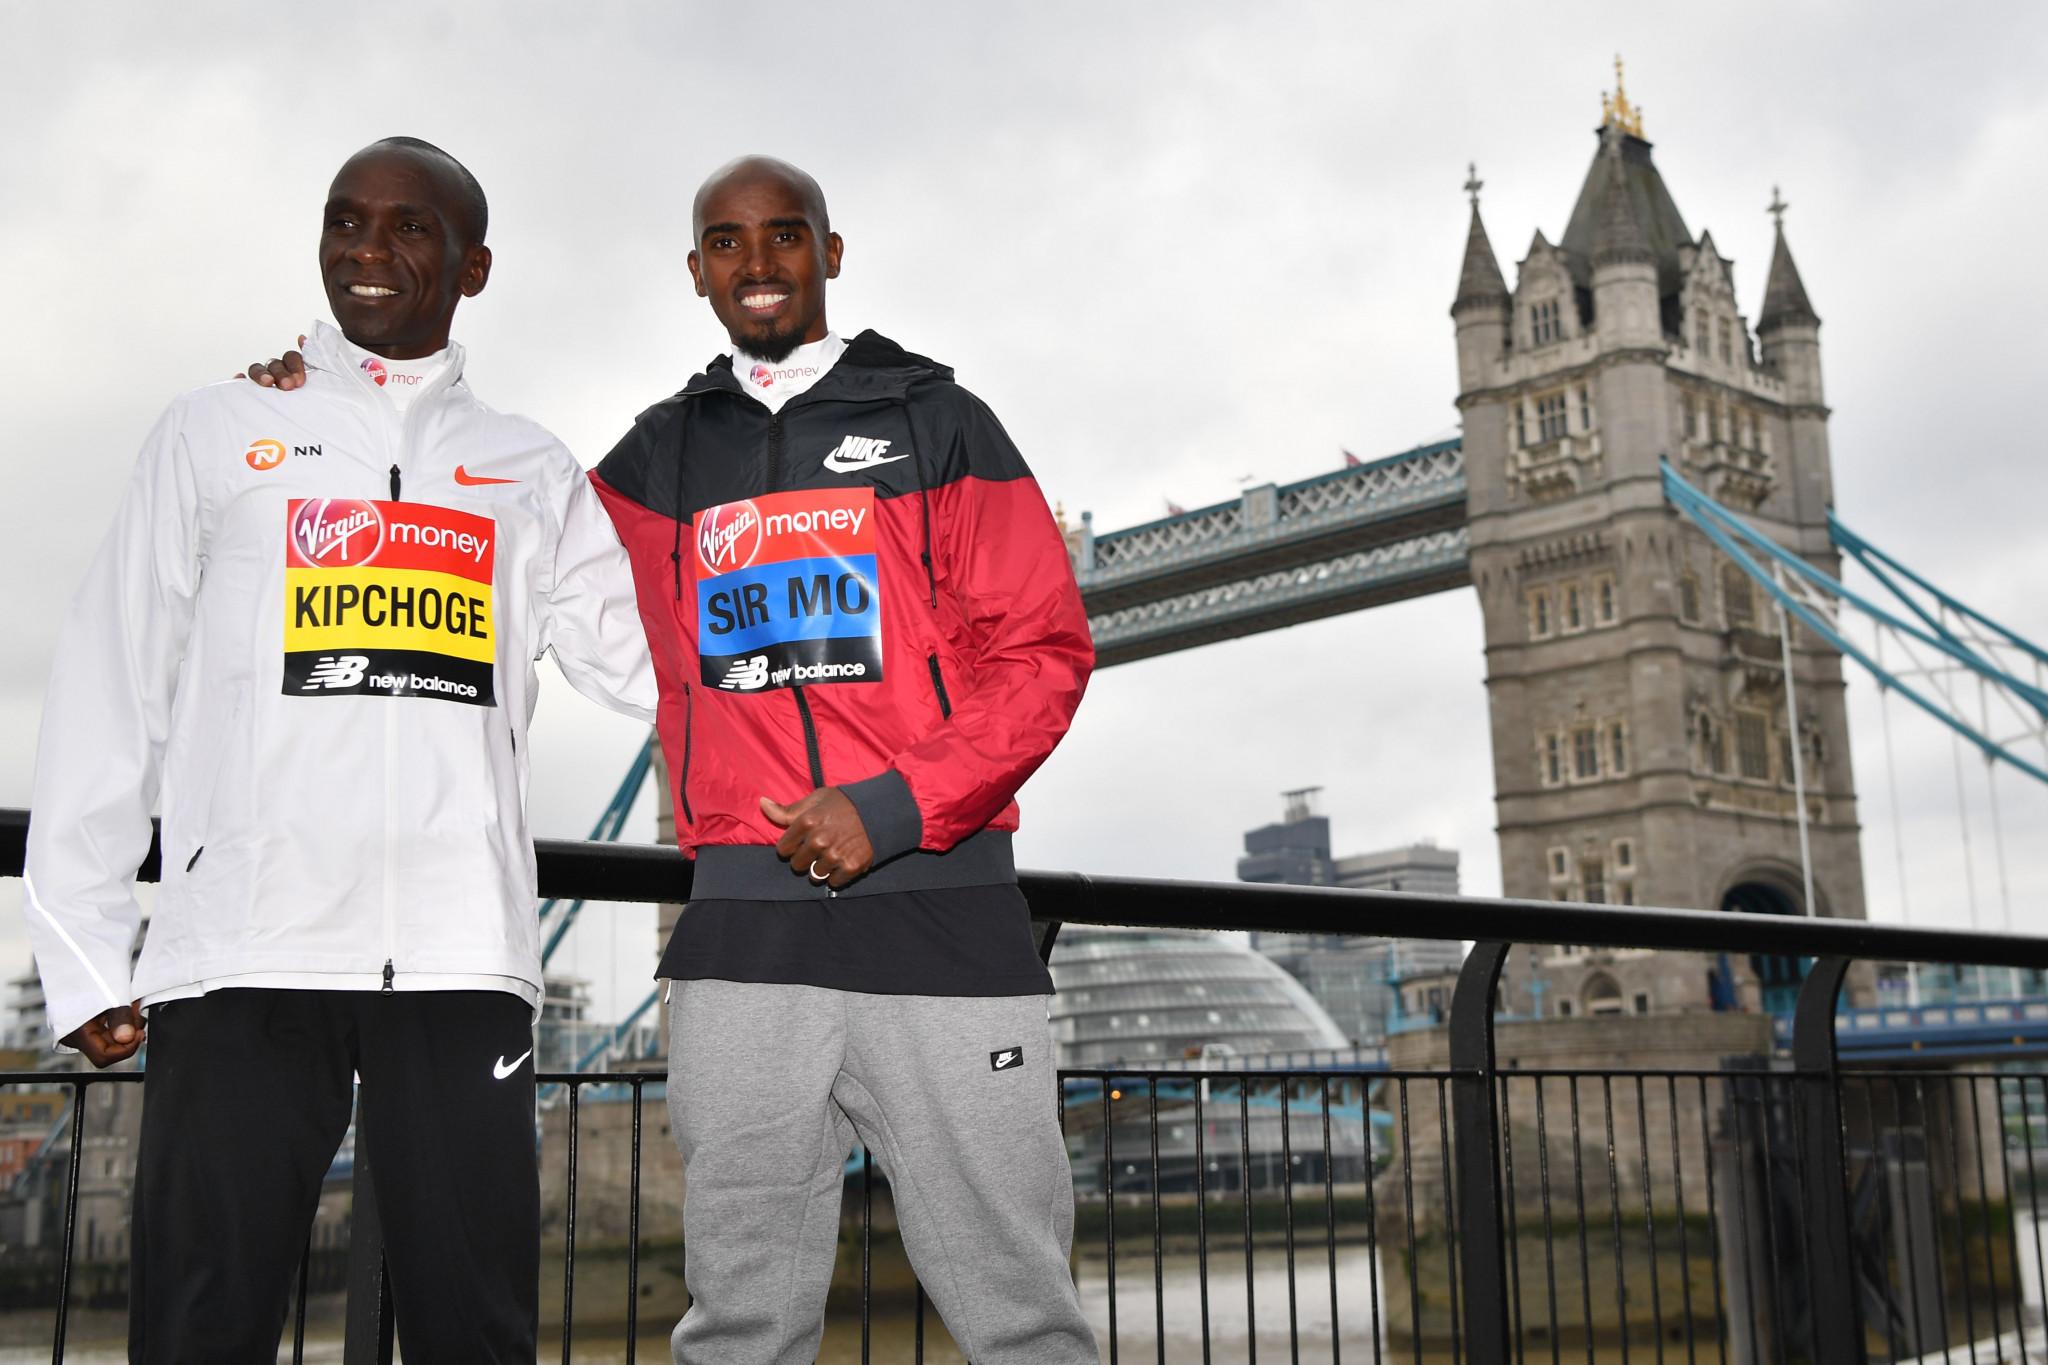 Kipchoge and Cheruiyot aim to defend London Marathon titles